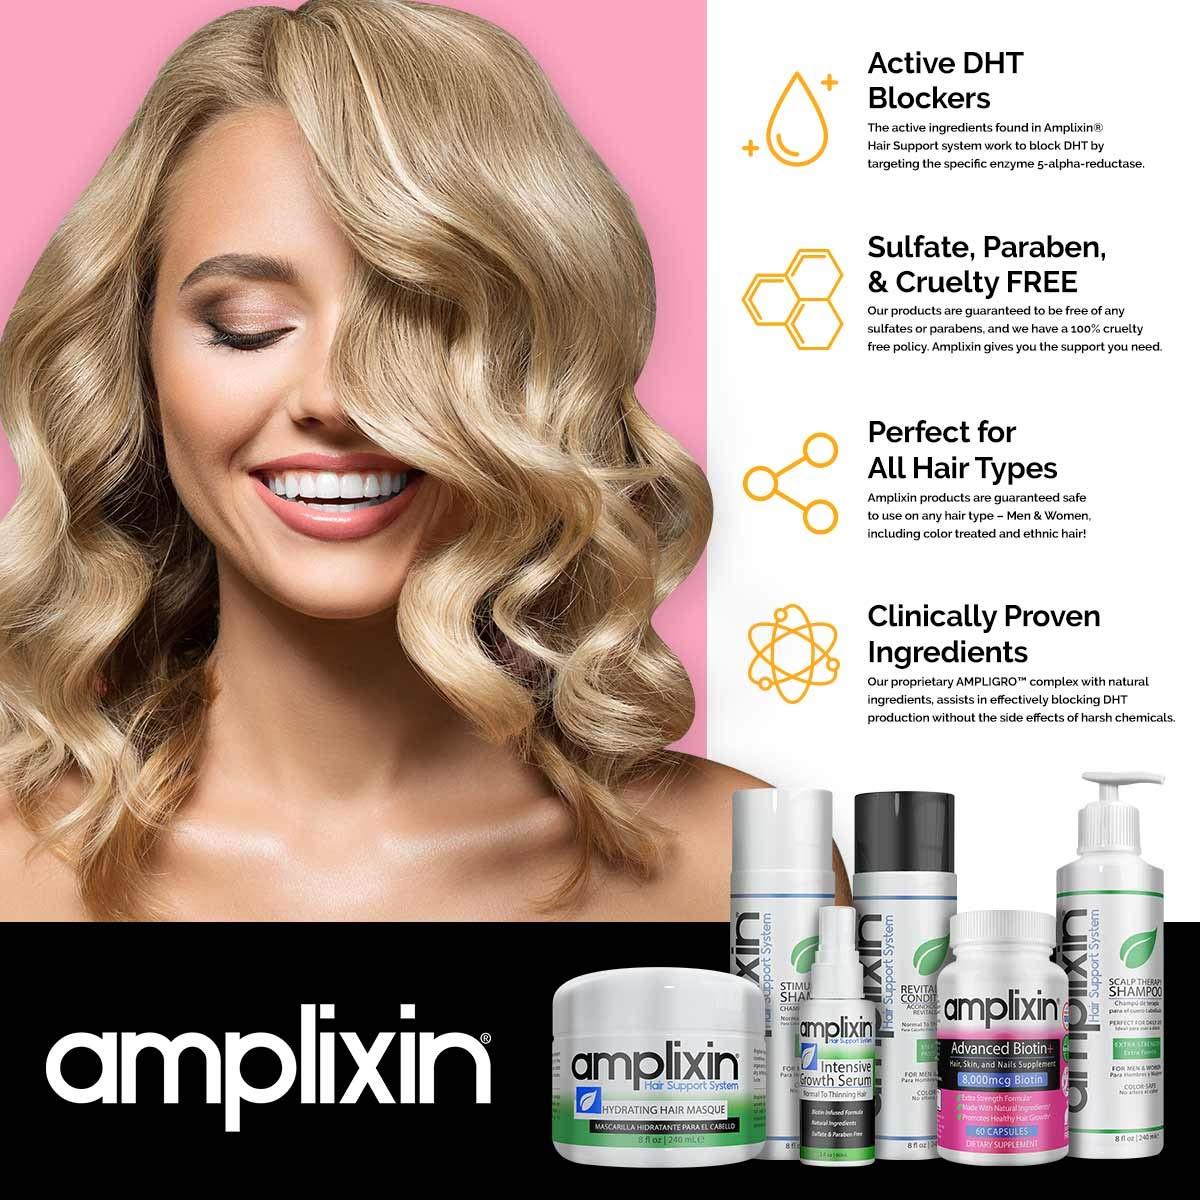 Amplixin Stimulating Hair Growth Shampoo